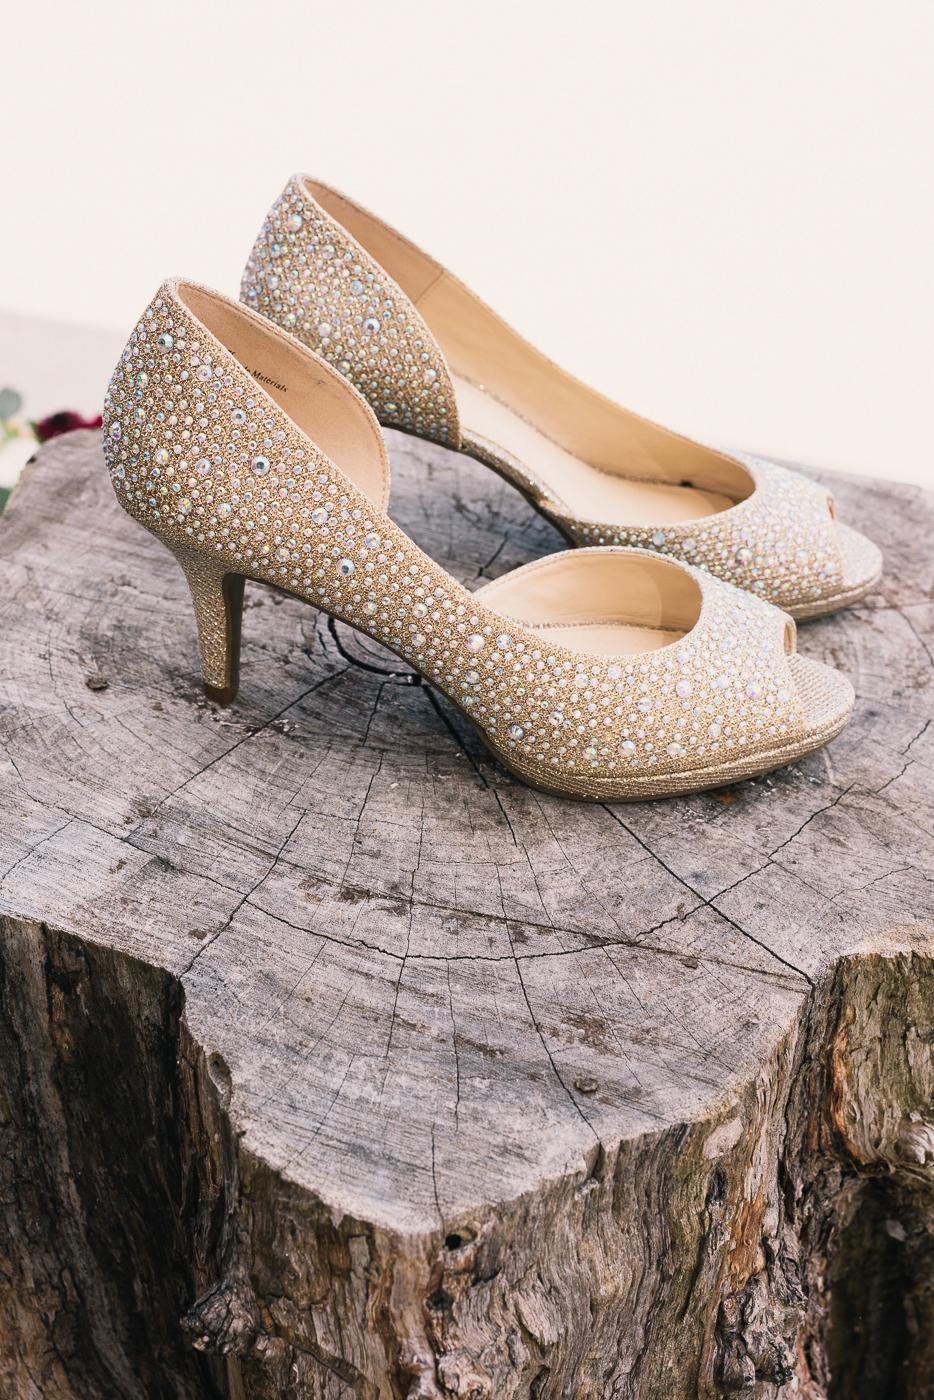 Wedding Shoes stump open toes off white tan studded wedding peep toe heels